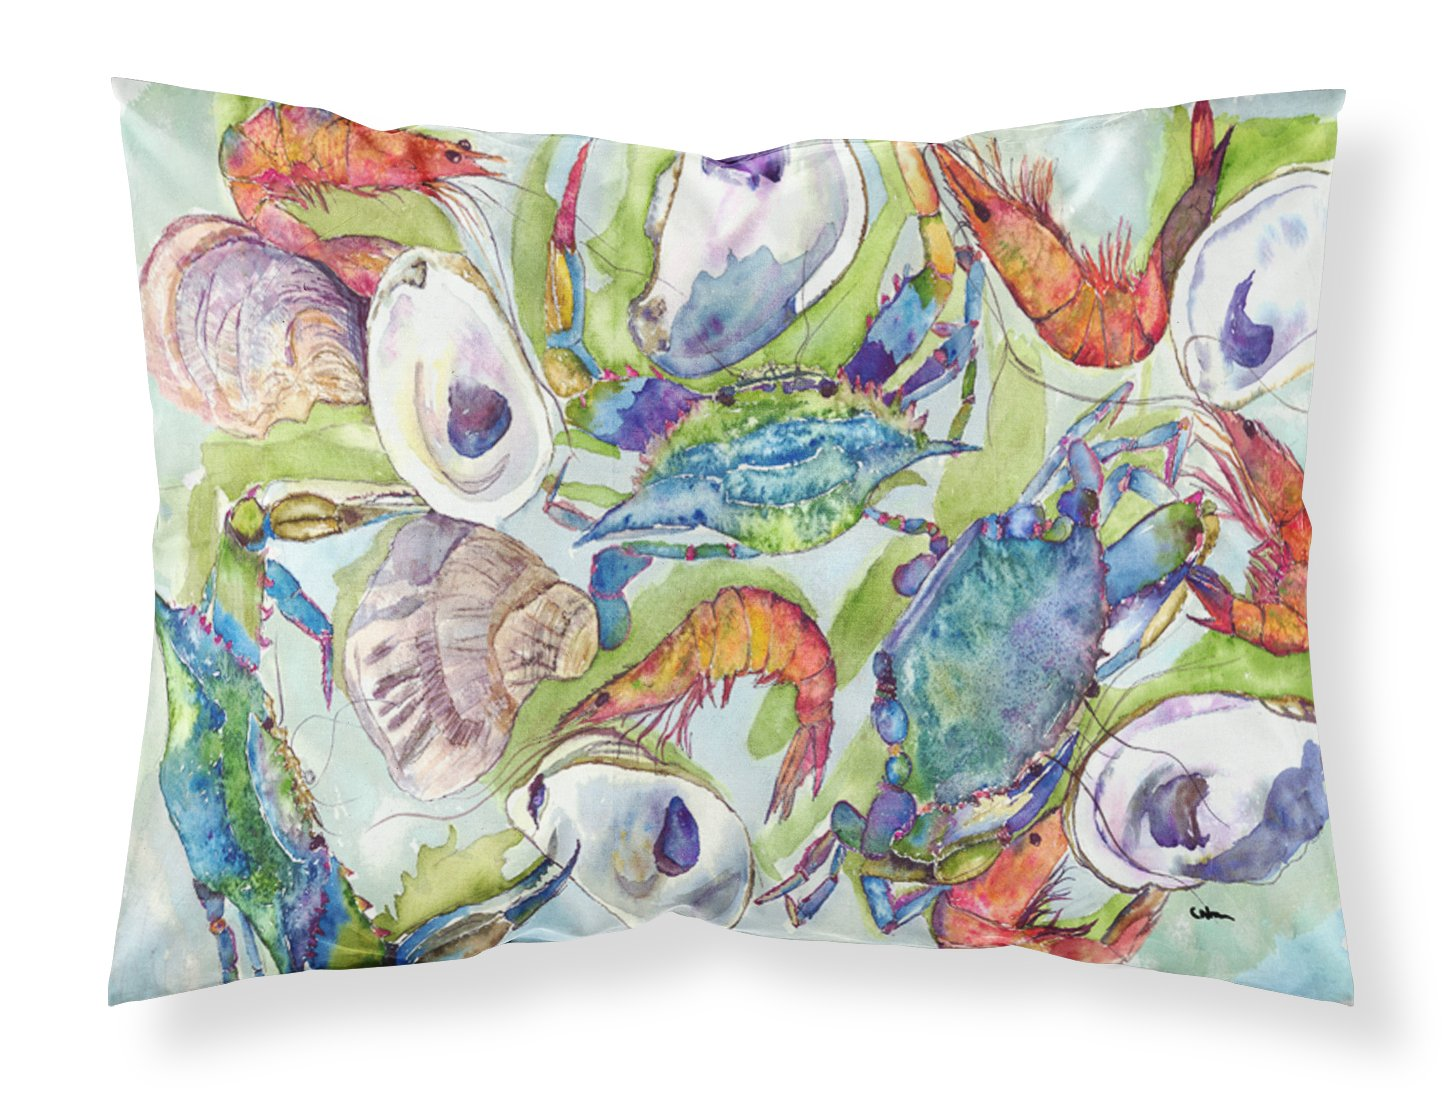 Large Carolines Treasures 8547PILLOWCASE Crab Moisture Wicking Fabric Standard Pillowcase Multicolor